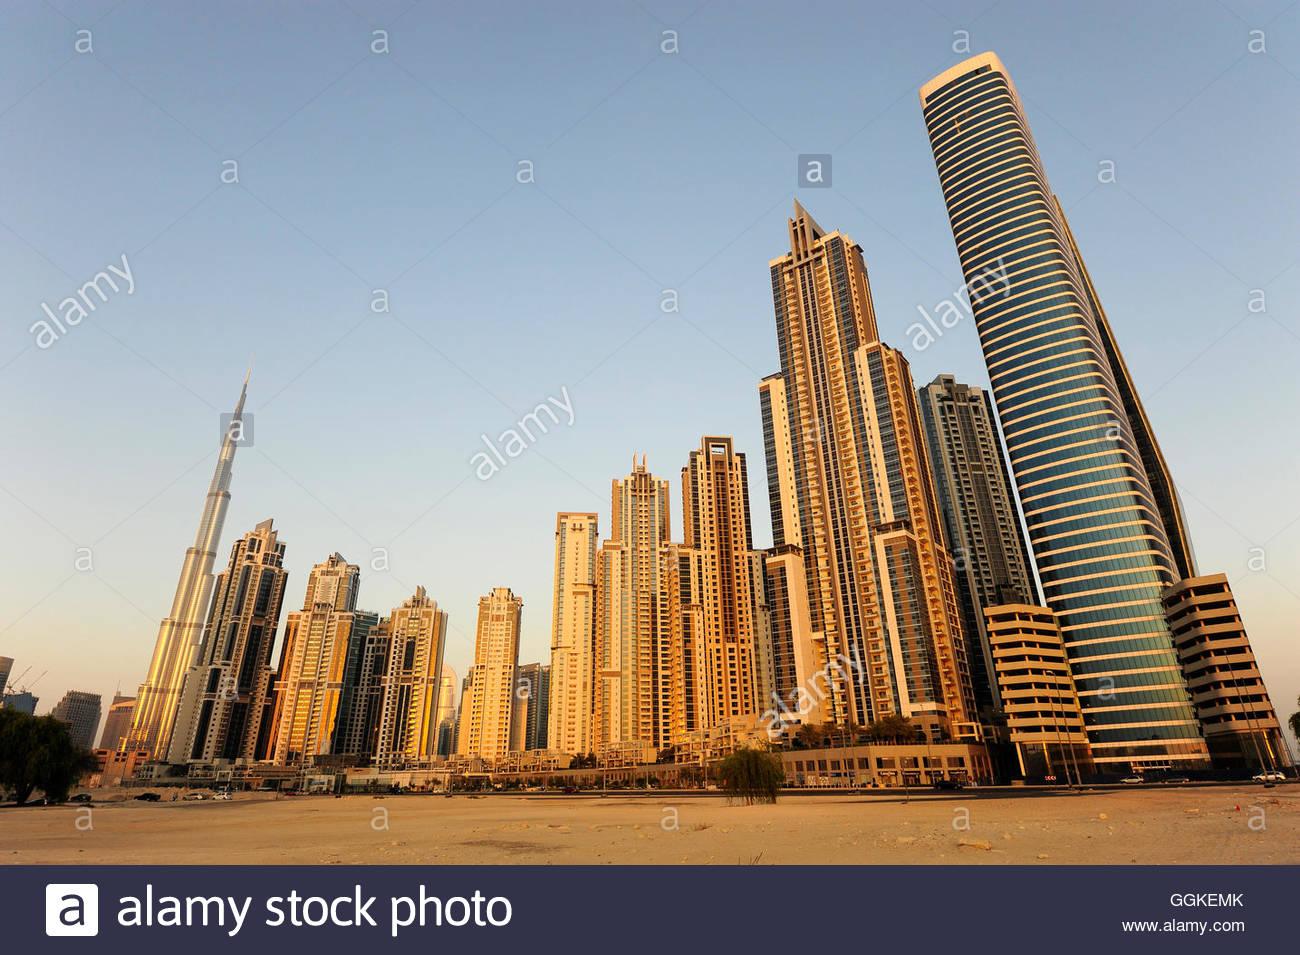 Skyscrapers in Business Bay, Dubai, United Arab Emirates - Stock Image